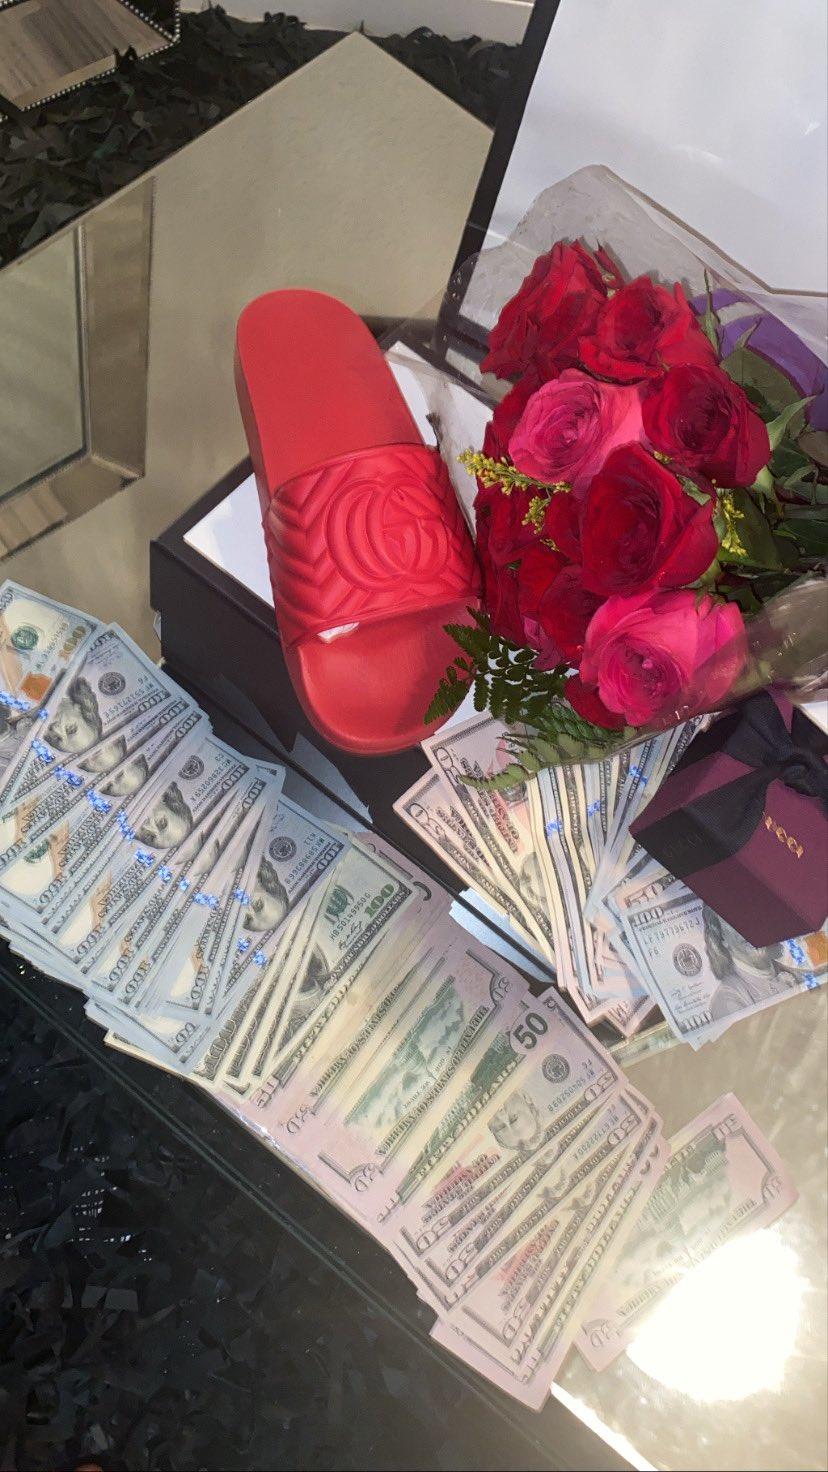 man materialistic